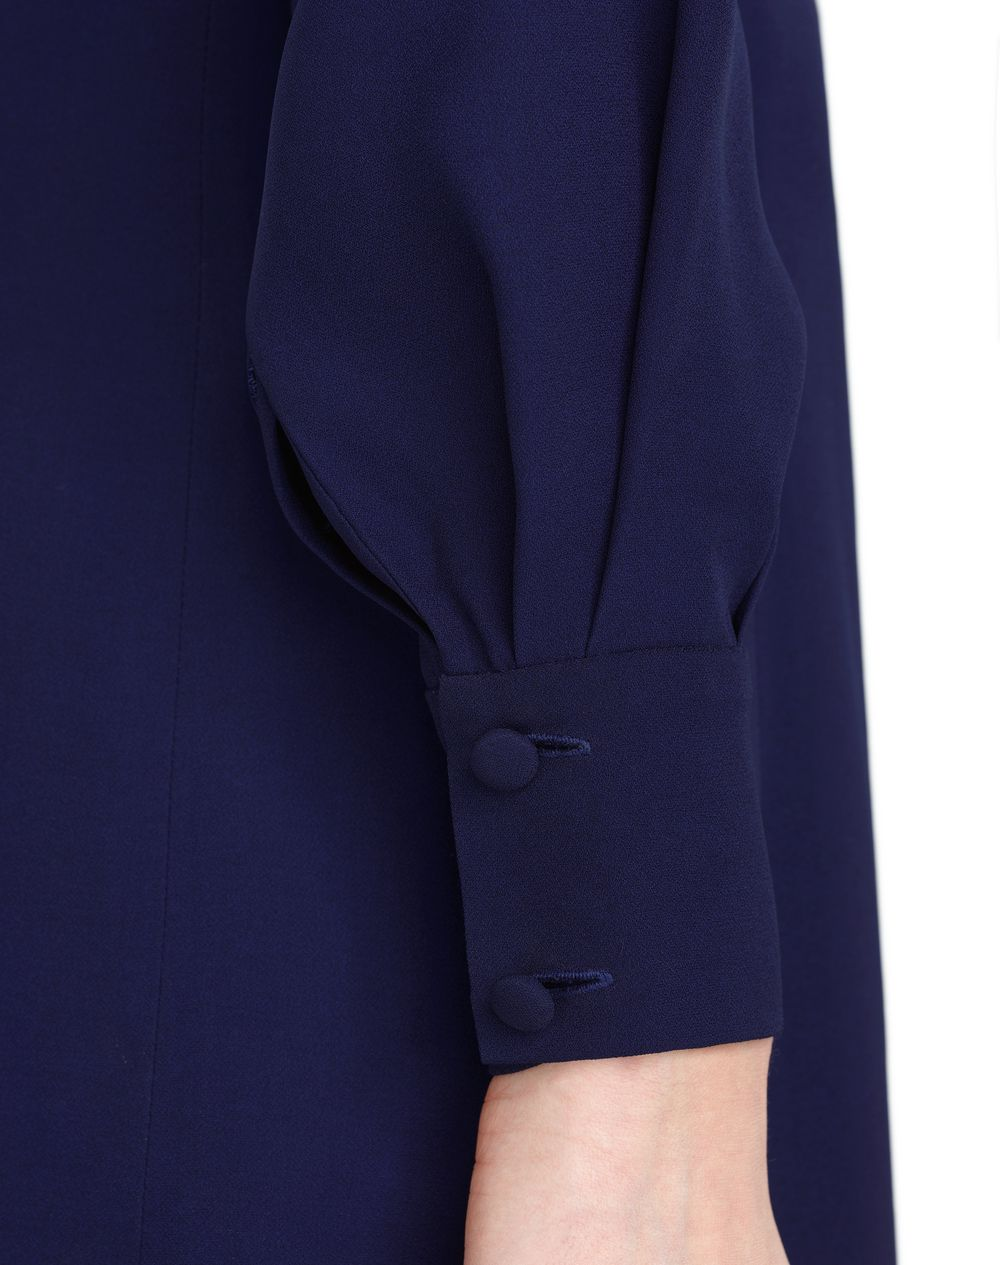 FLOWY CREPE DRESS - Lanvin